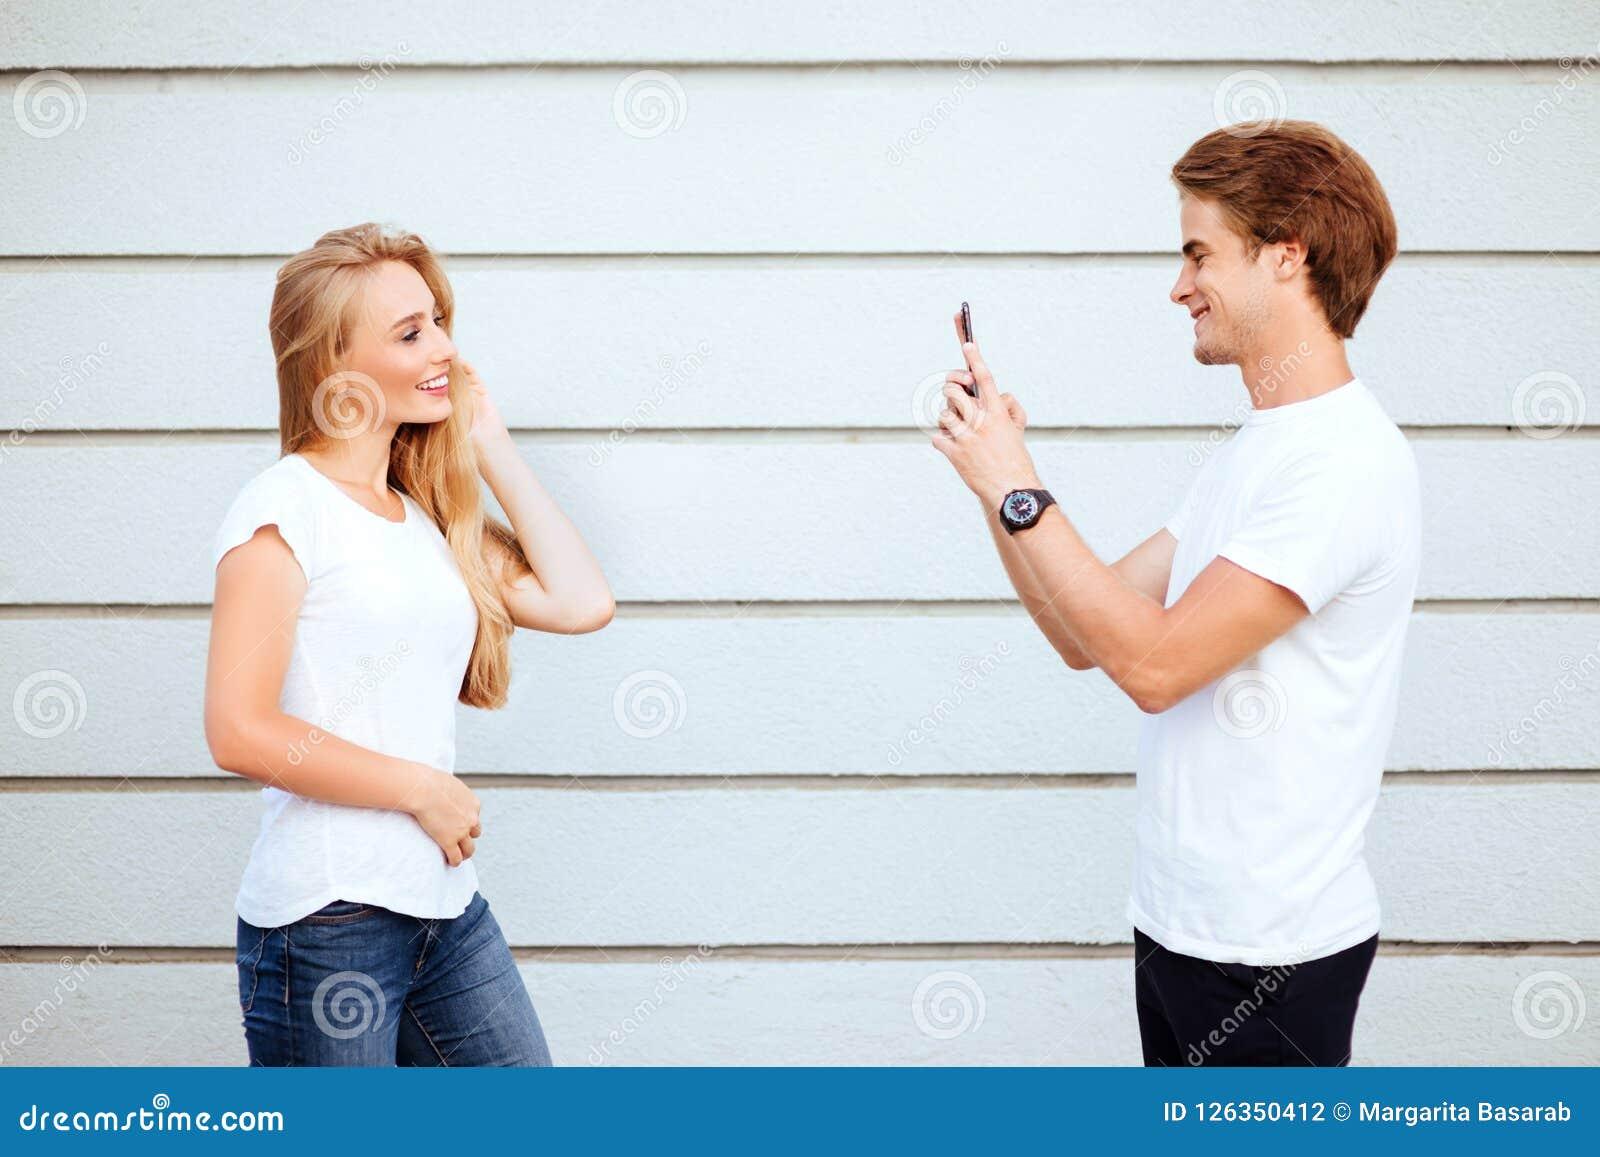 Jonge volwassen hipsters jongen en meisje in witte T-shirts glimlach en het maken selfie